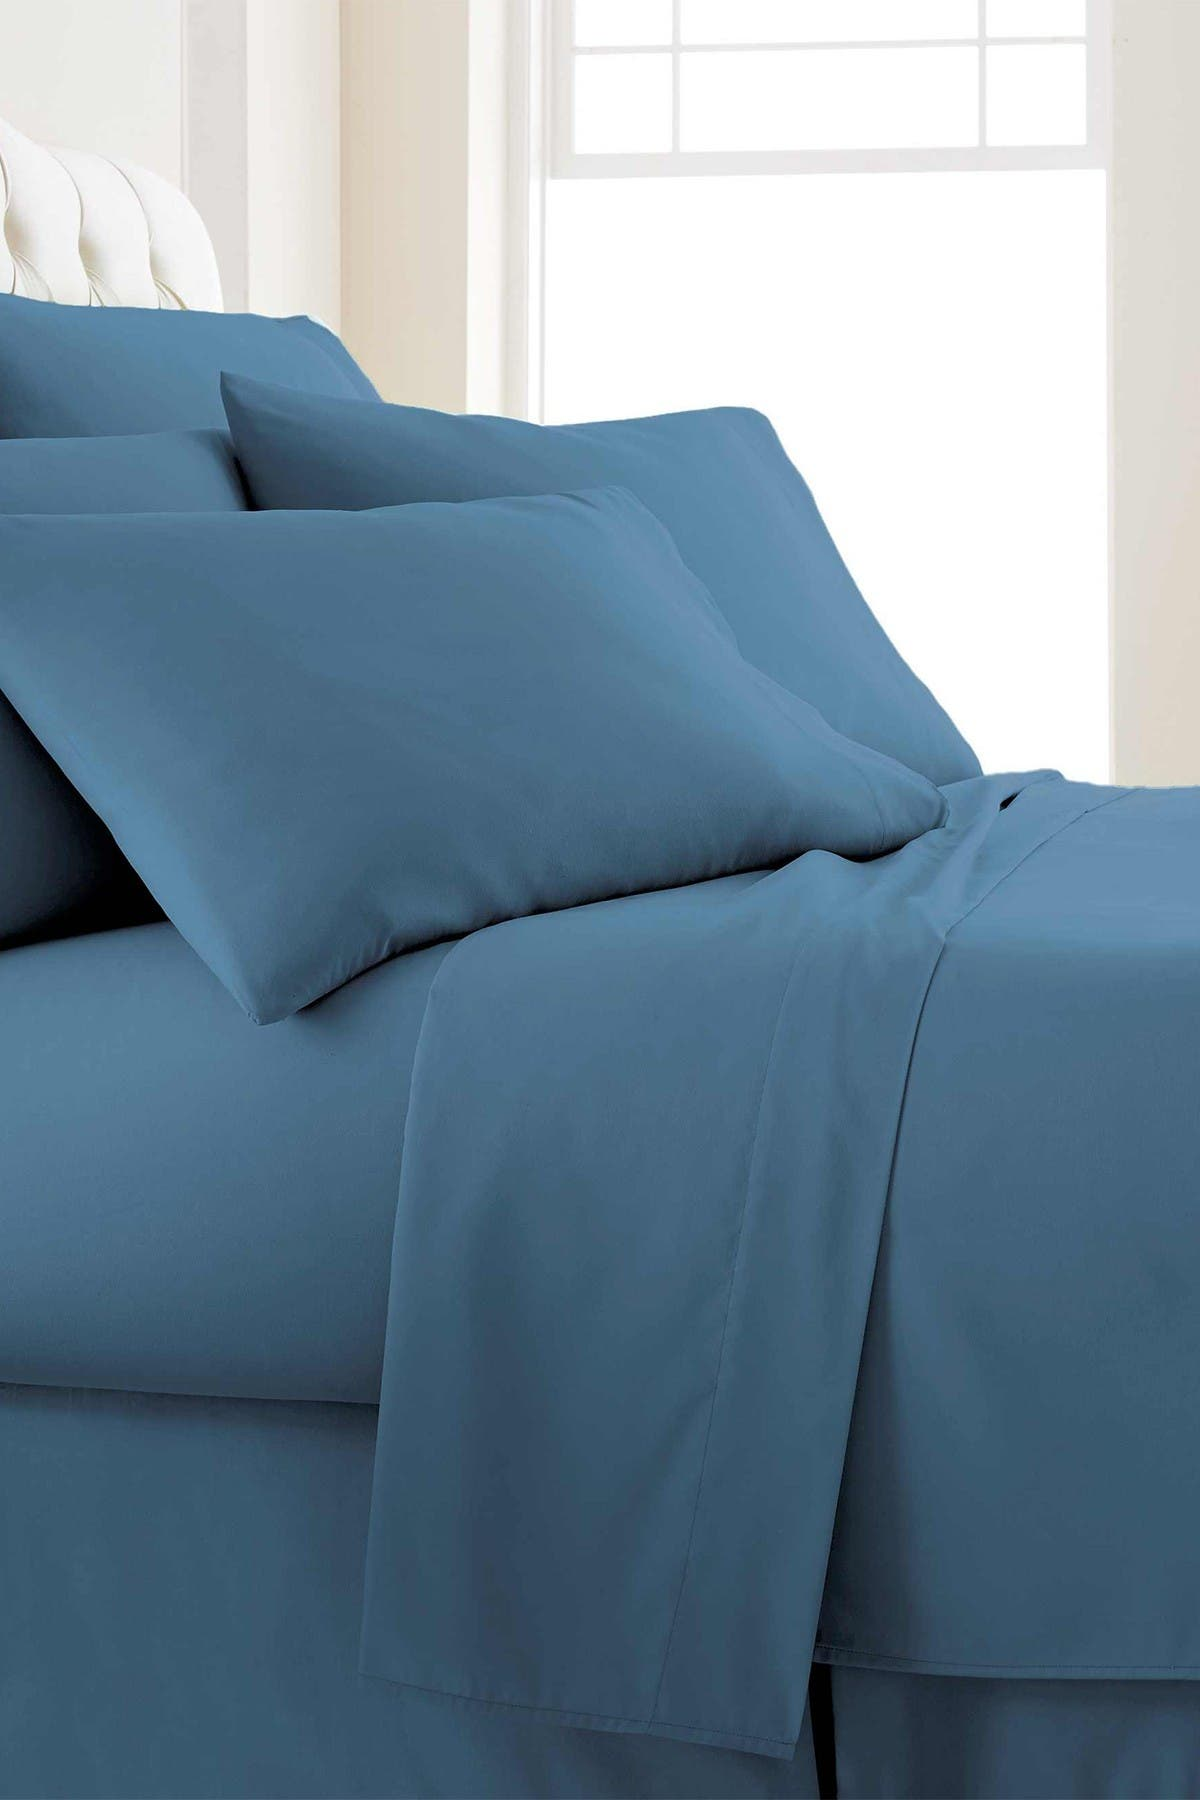 Image of SOUTHSHORE FINE LINENS Queen Sized Vilano Springs Extra Deep Pocket Sheet Set - Coronet Blue